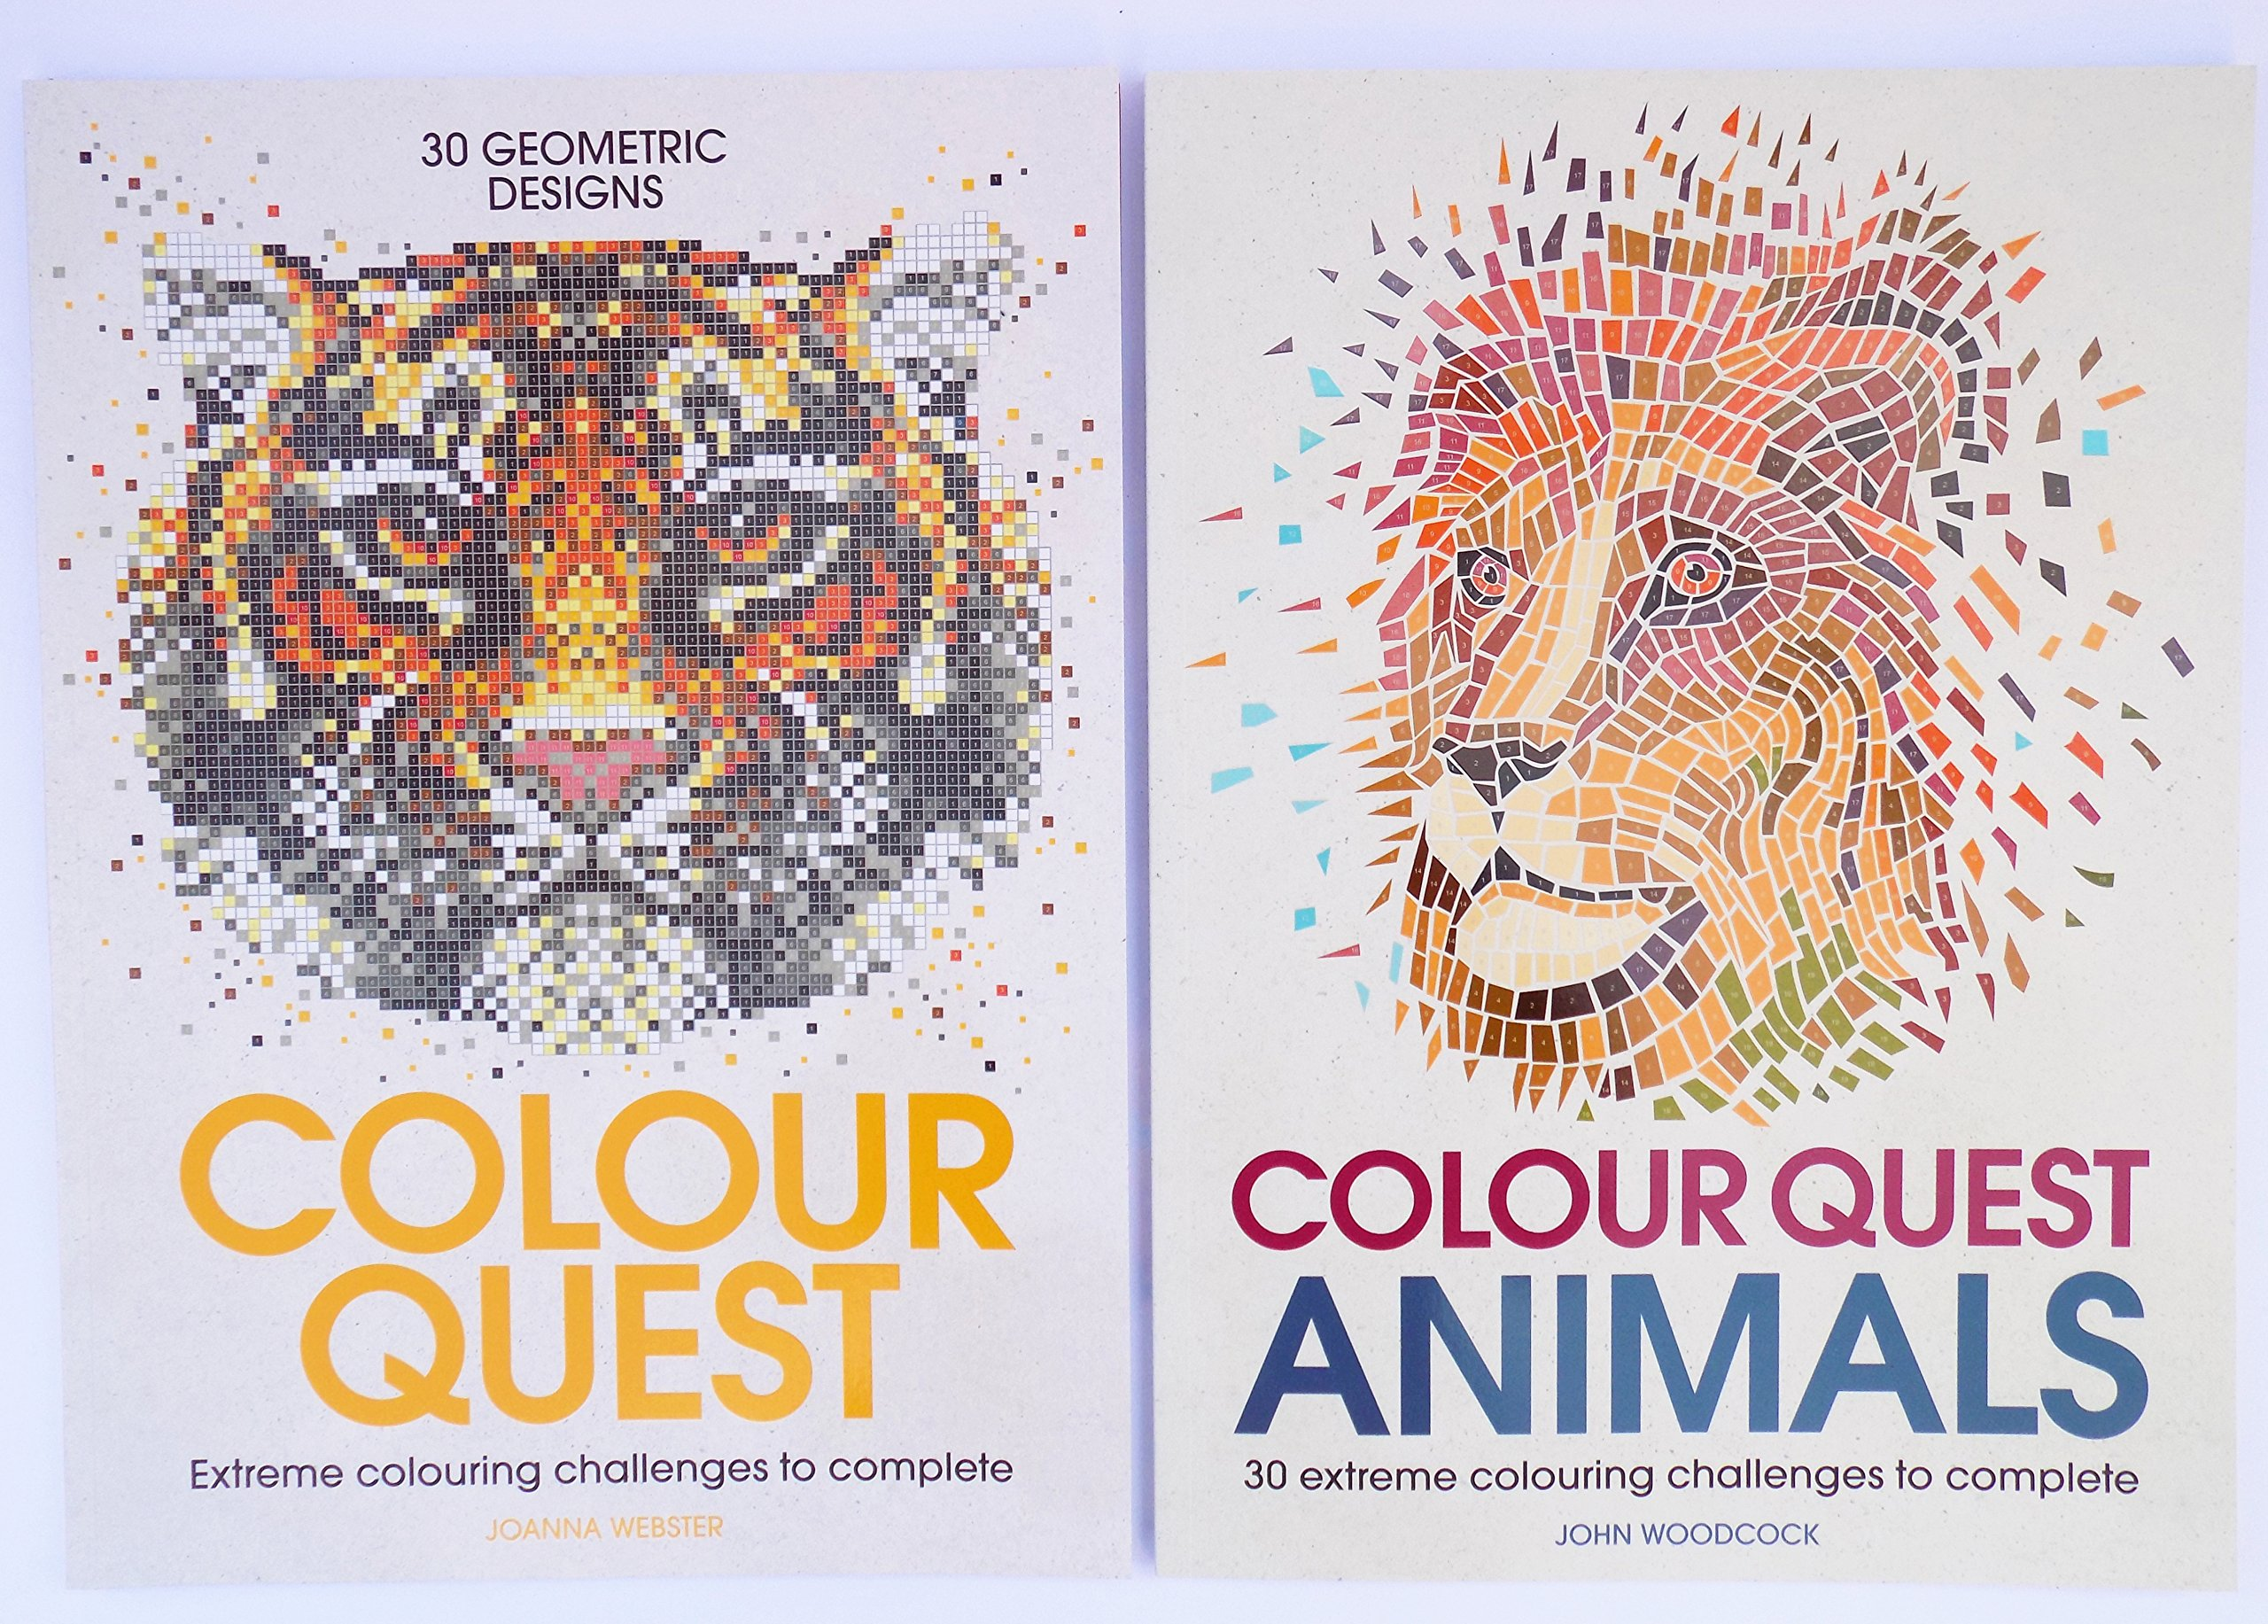 Colour Quest Animals (Colouring Books): Amazon.co.uk: John Woodcock ...